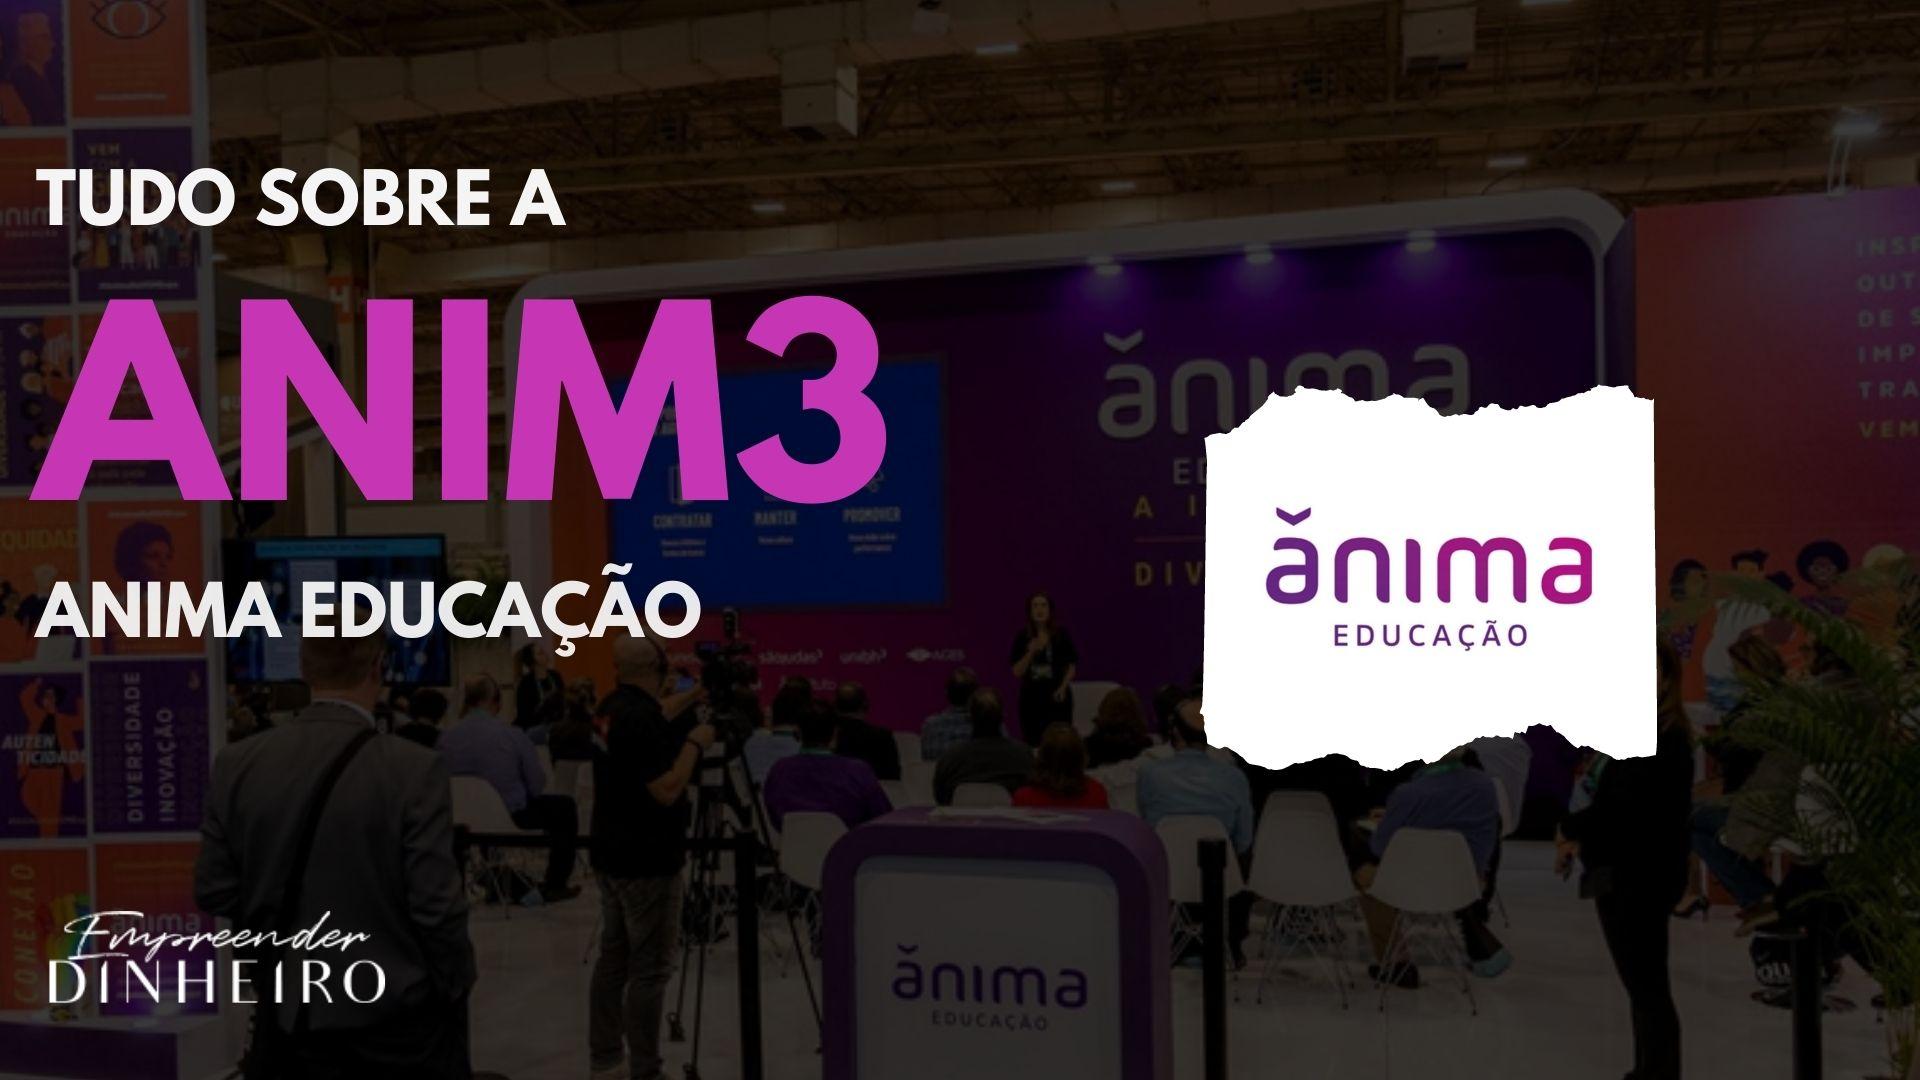 anim3